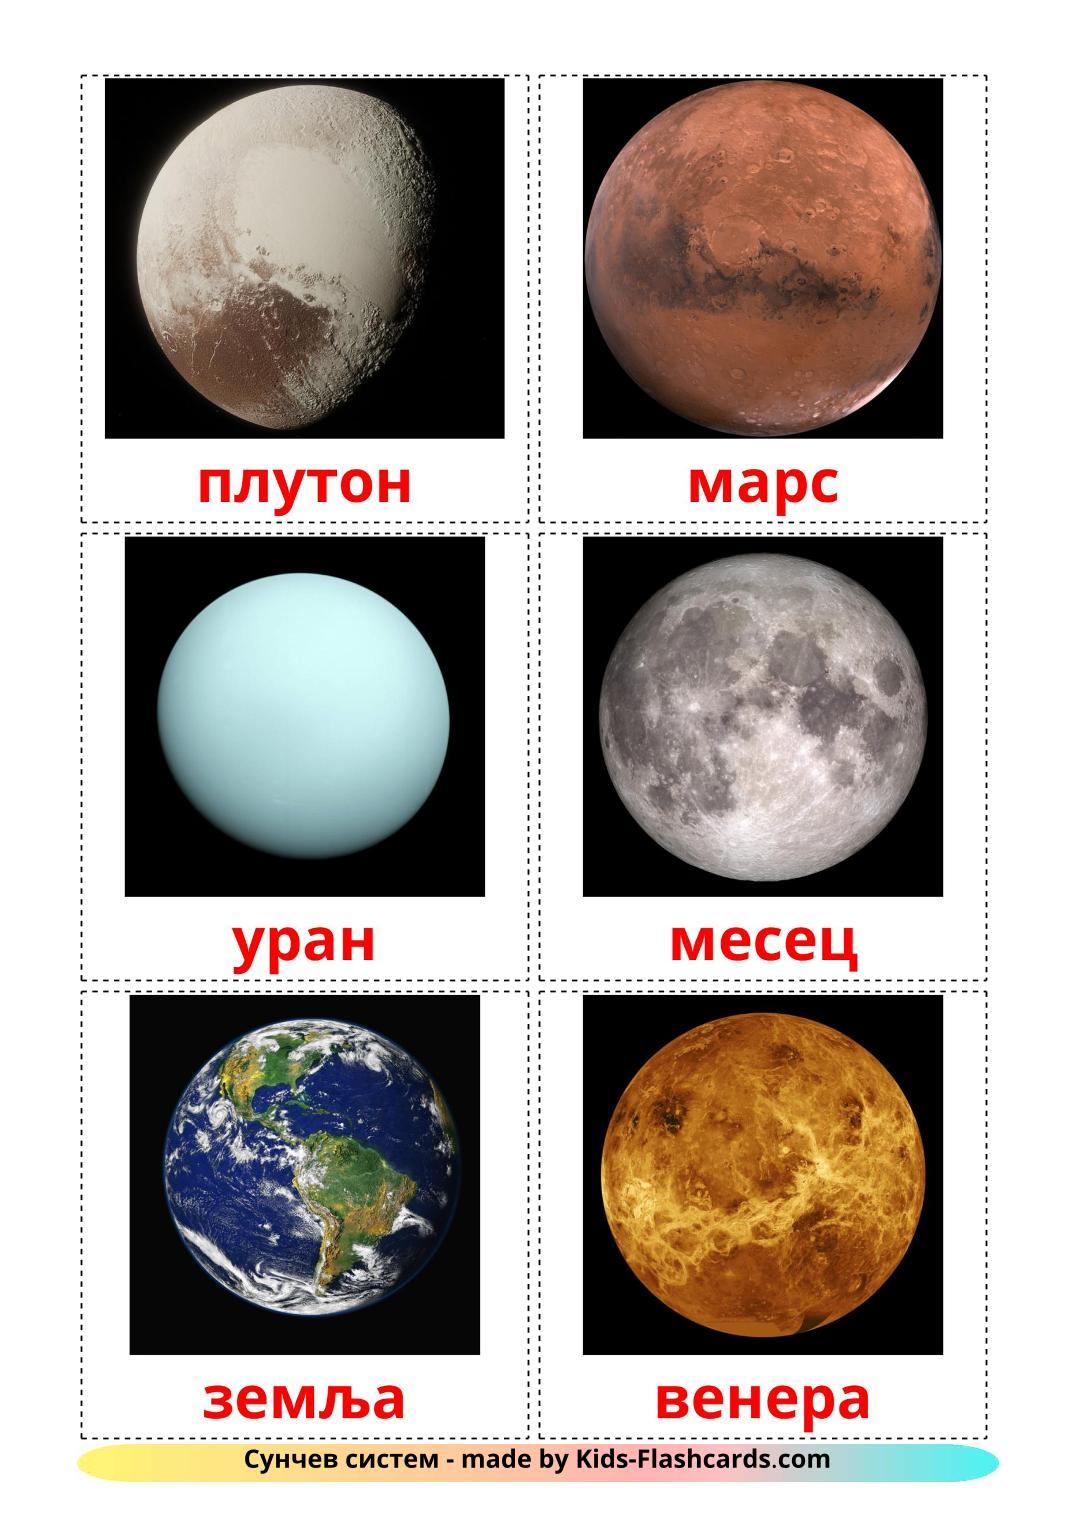 Солнечная система - 20 Карточек Домана на сербский(кириллица)